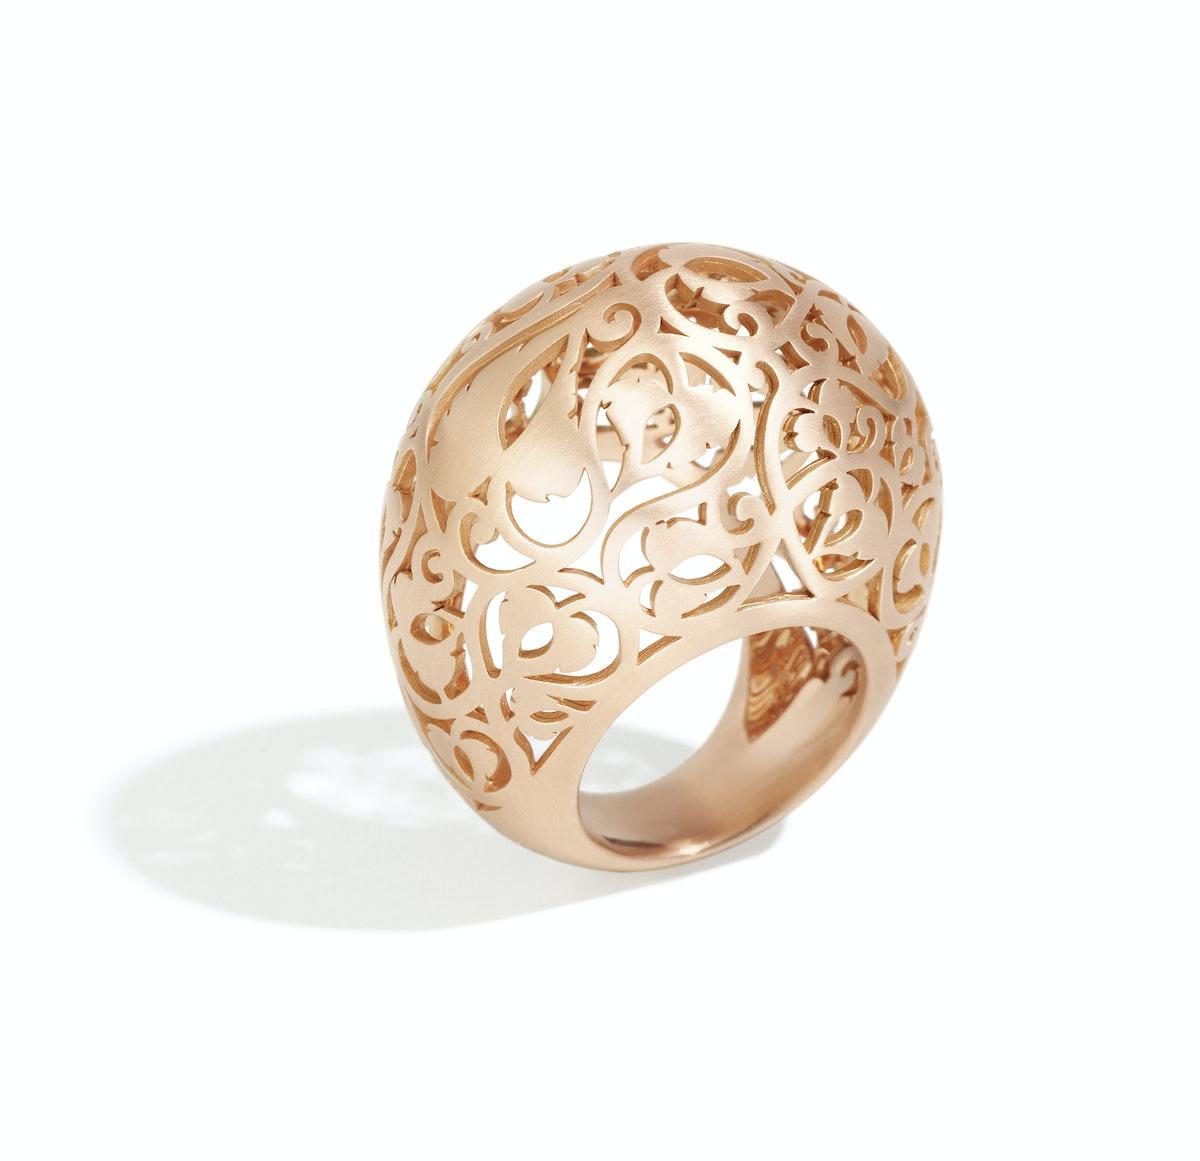 Pomellato gold ring